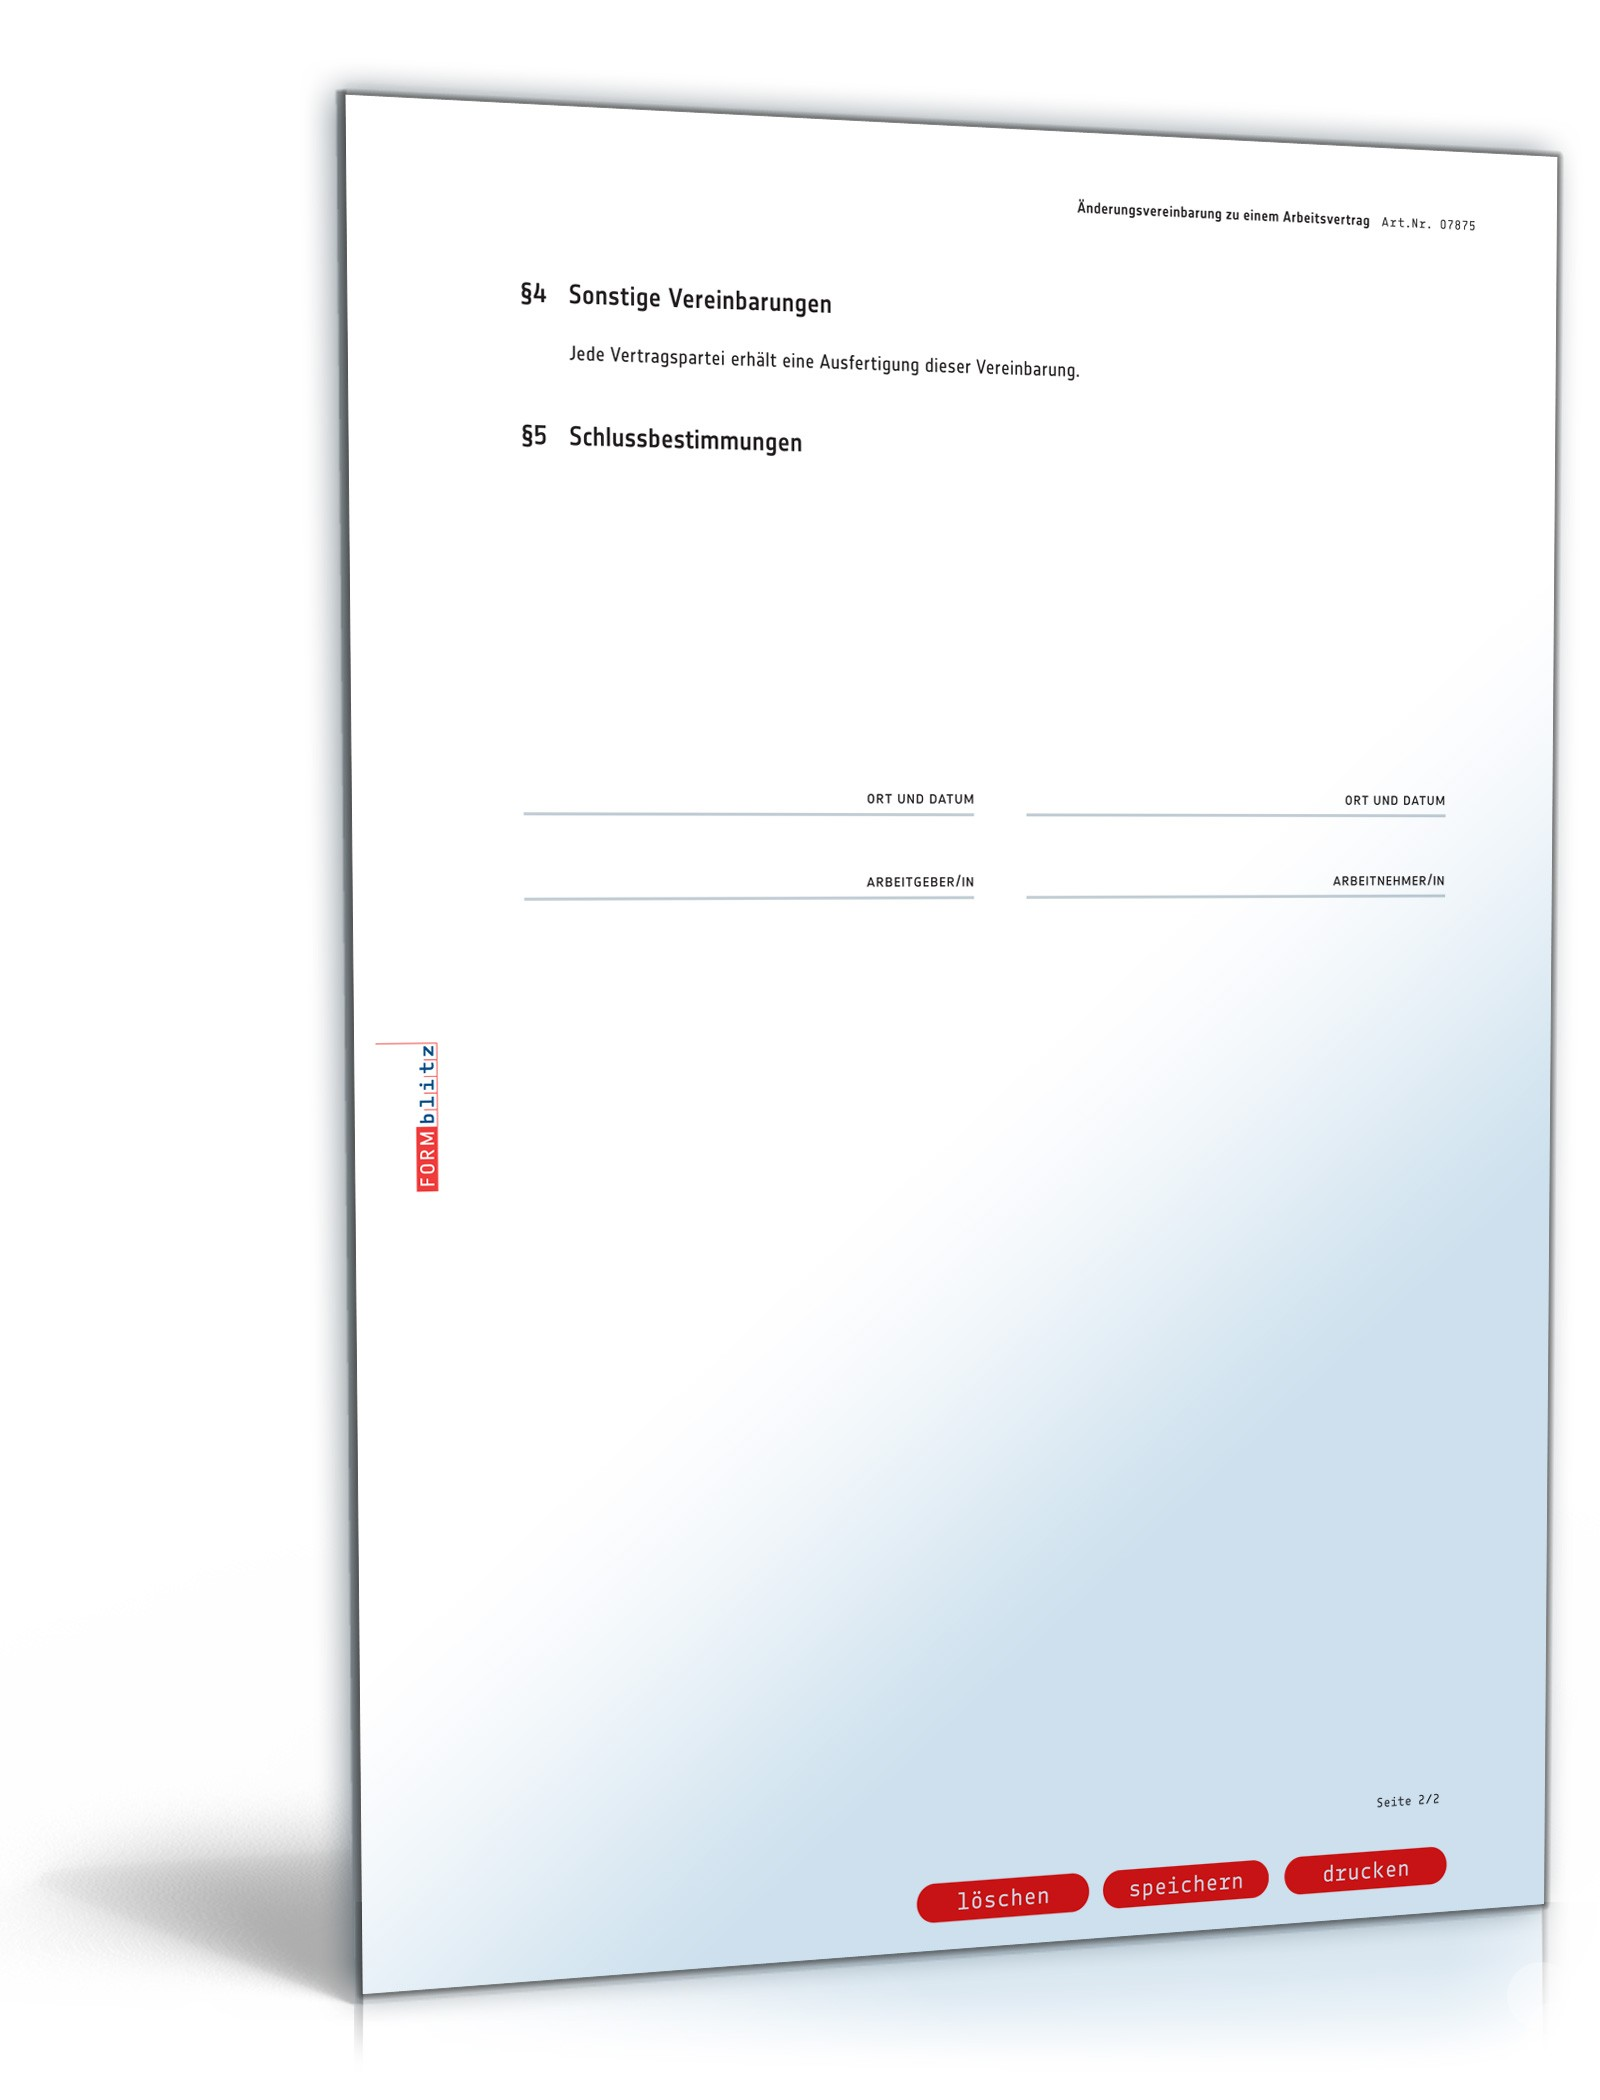 pdf seite 2 - Anderungsvertrag Muster